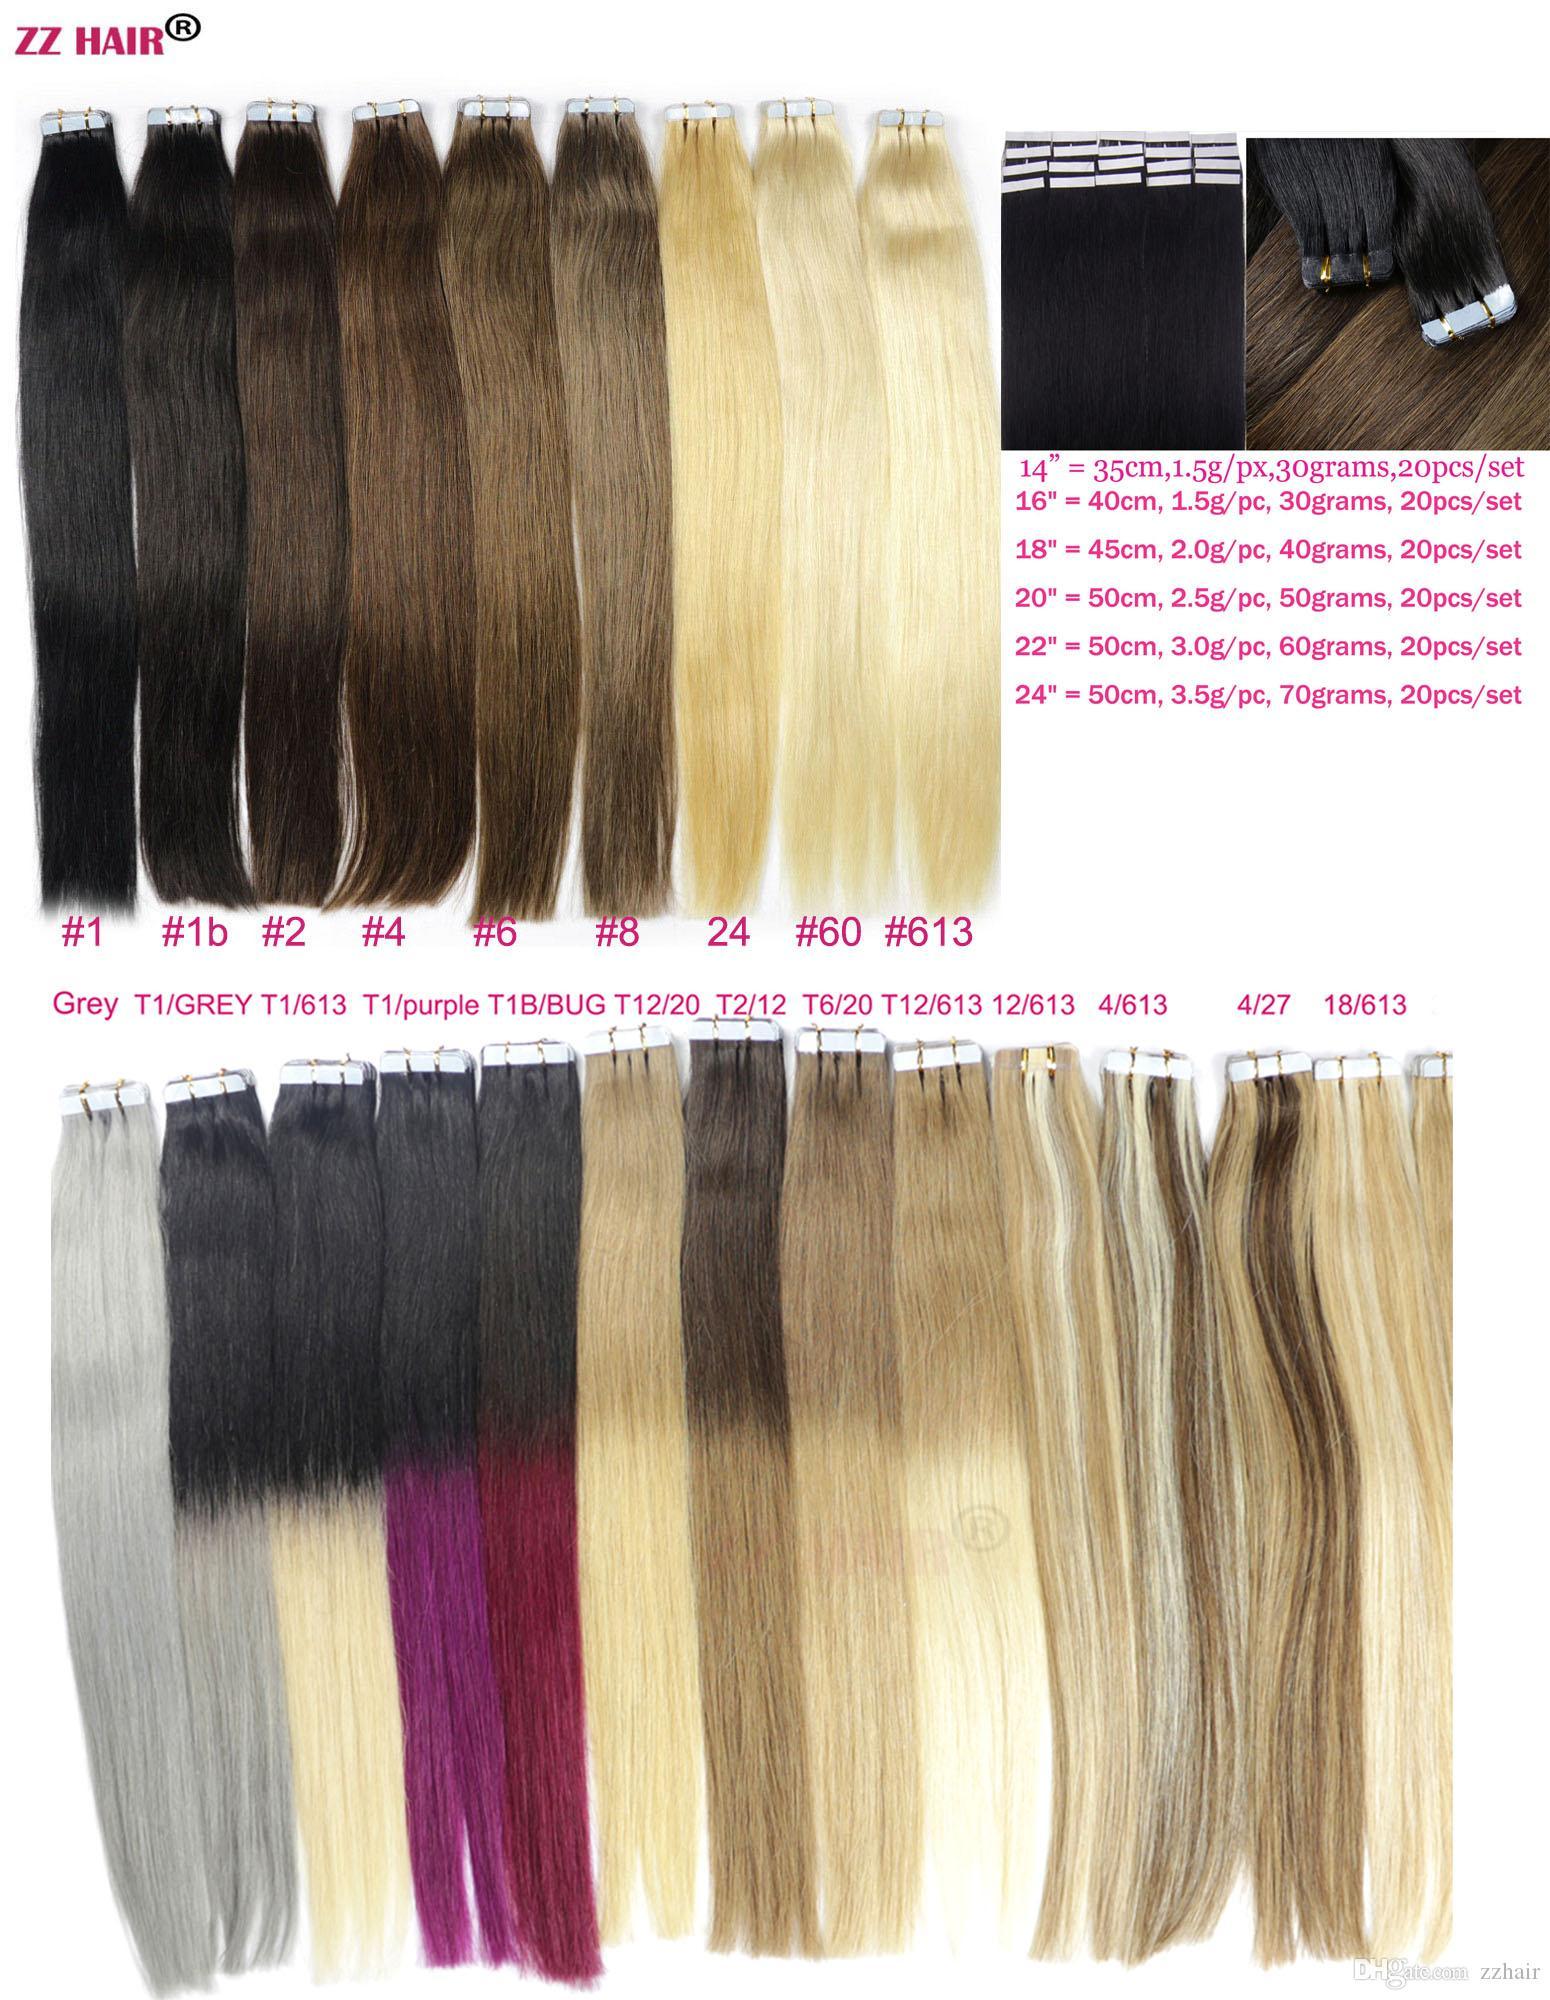 "ZZHAIR 14 ""-24""테이프 레미 헤어 100 % 인간의 머리카락 확장 20pcs / 팩 머리카락 피부 Weft 30g-70g에서 테이프"